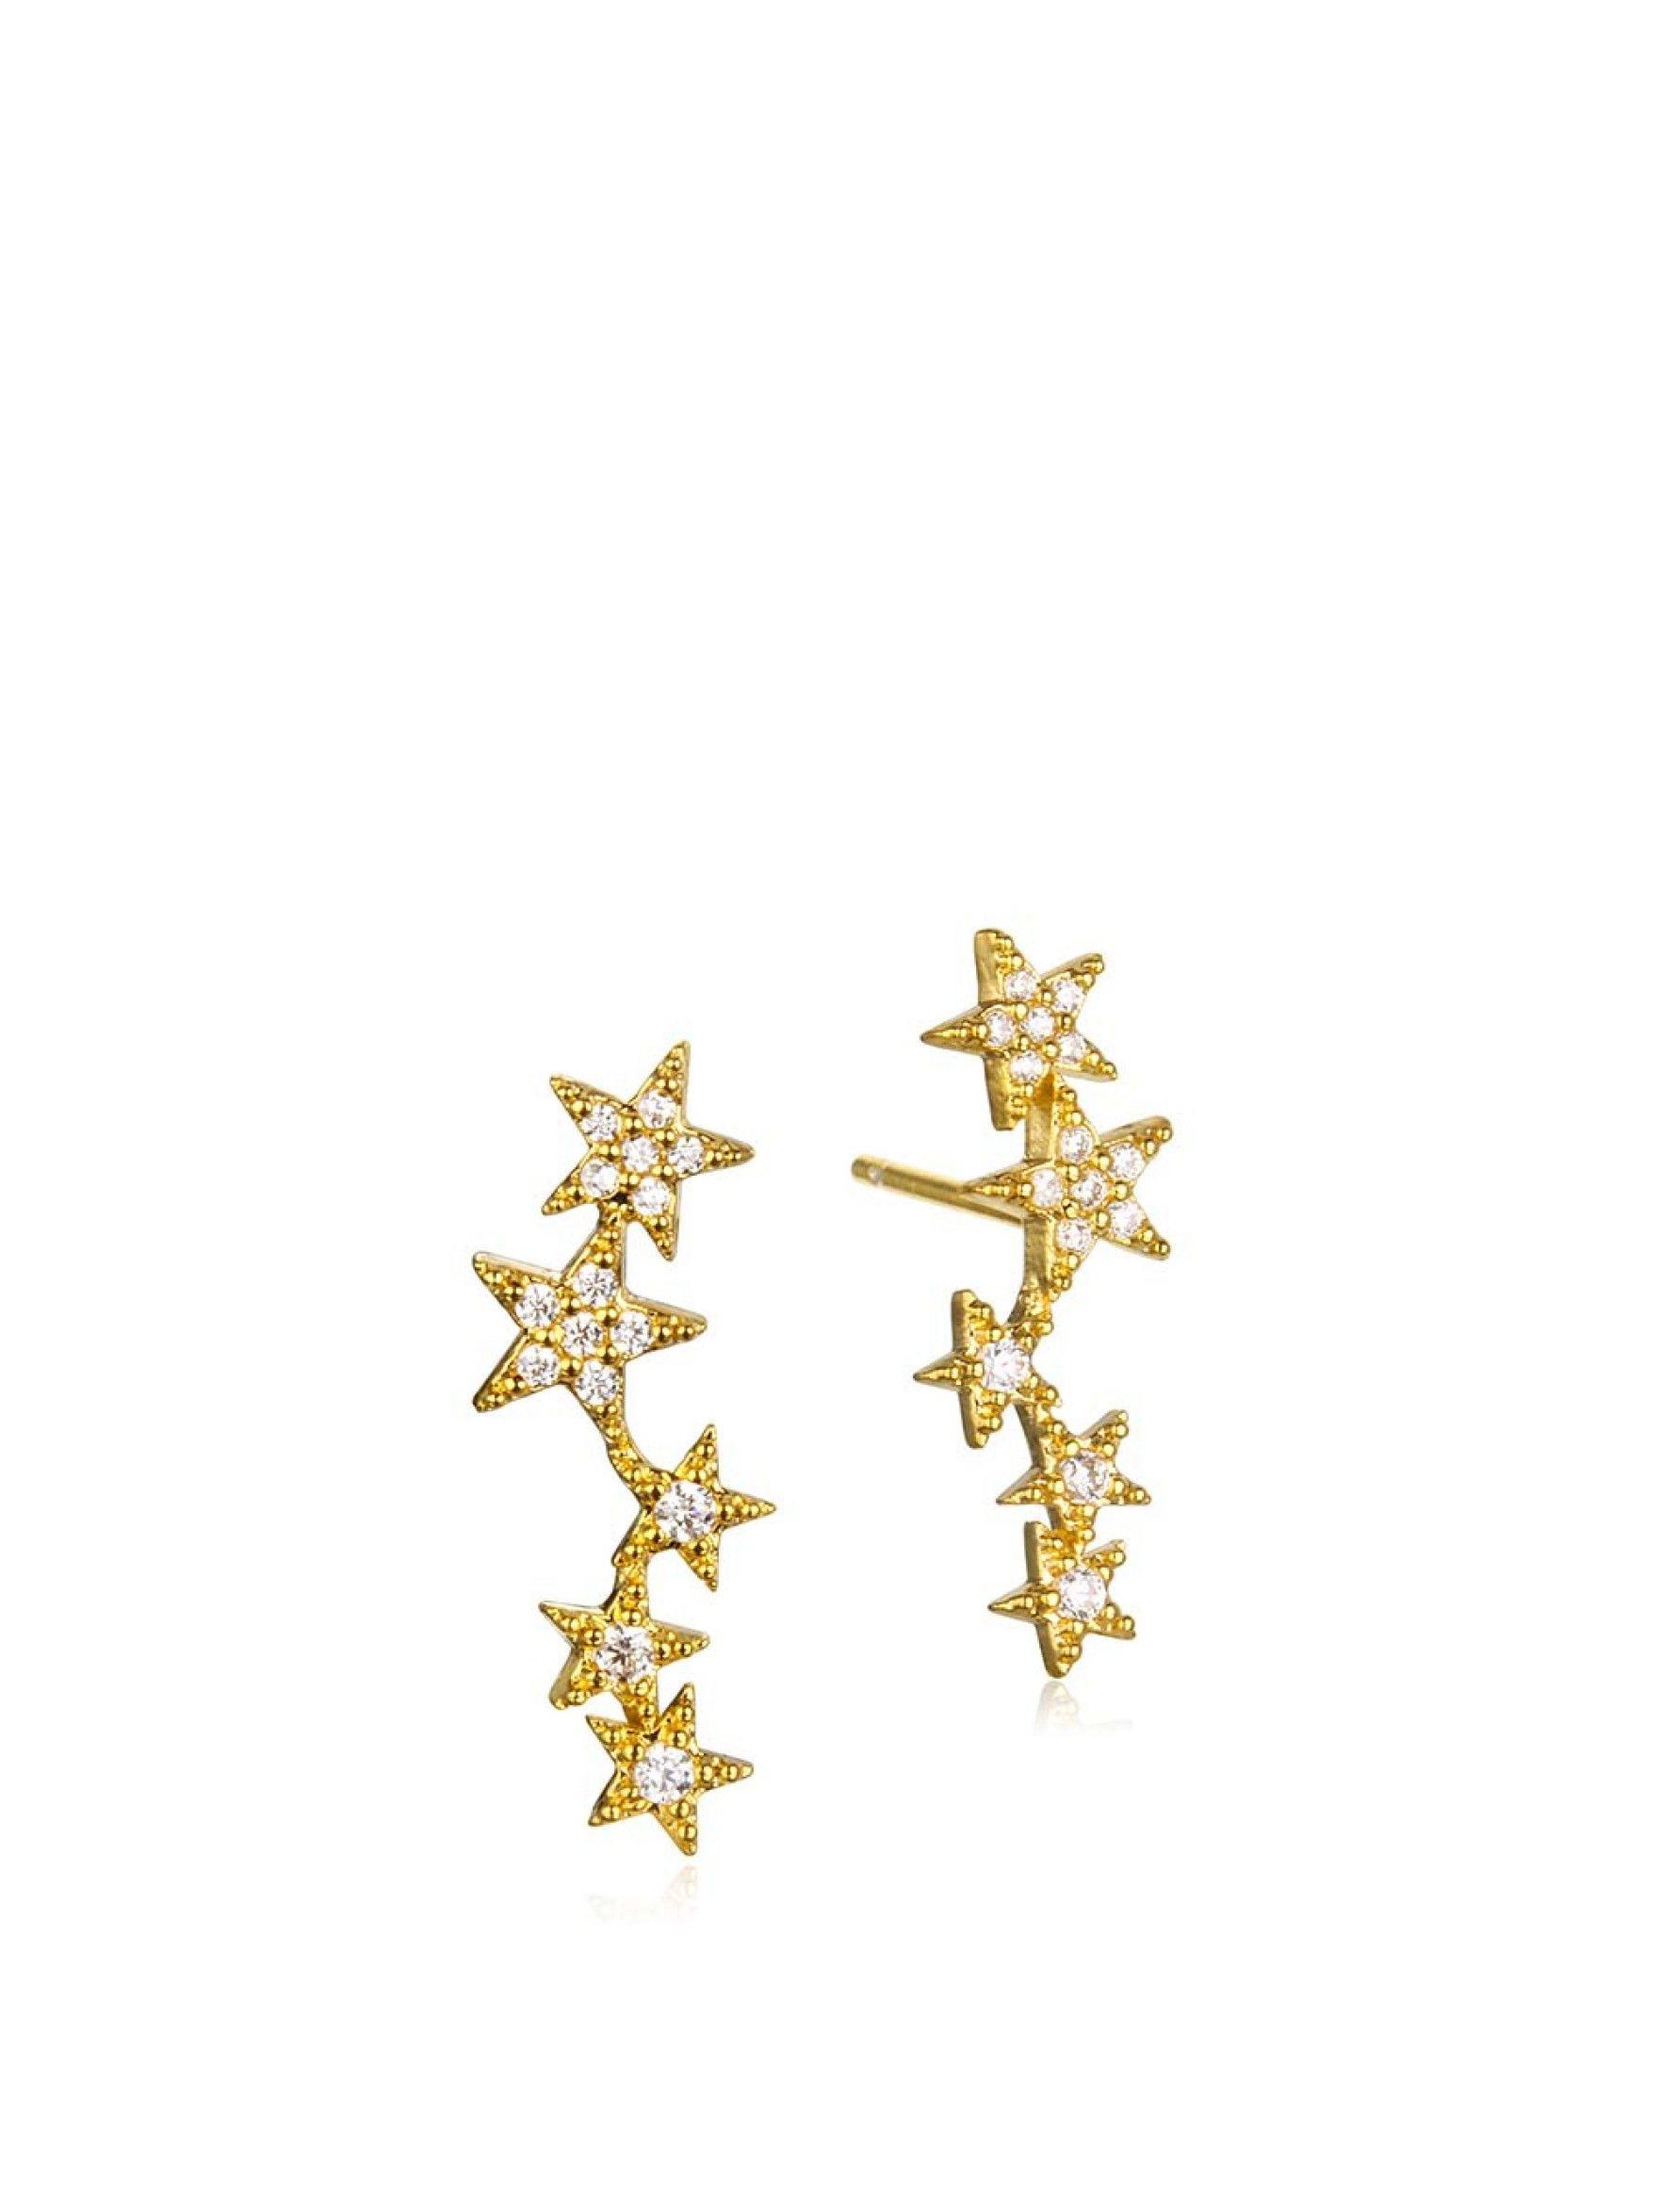 Tai JewelryEarrings5 Star Constellation Earrings